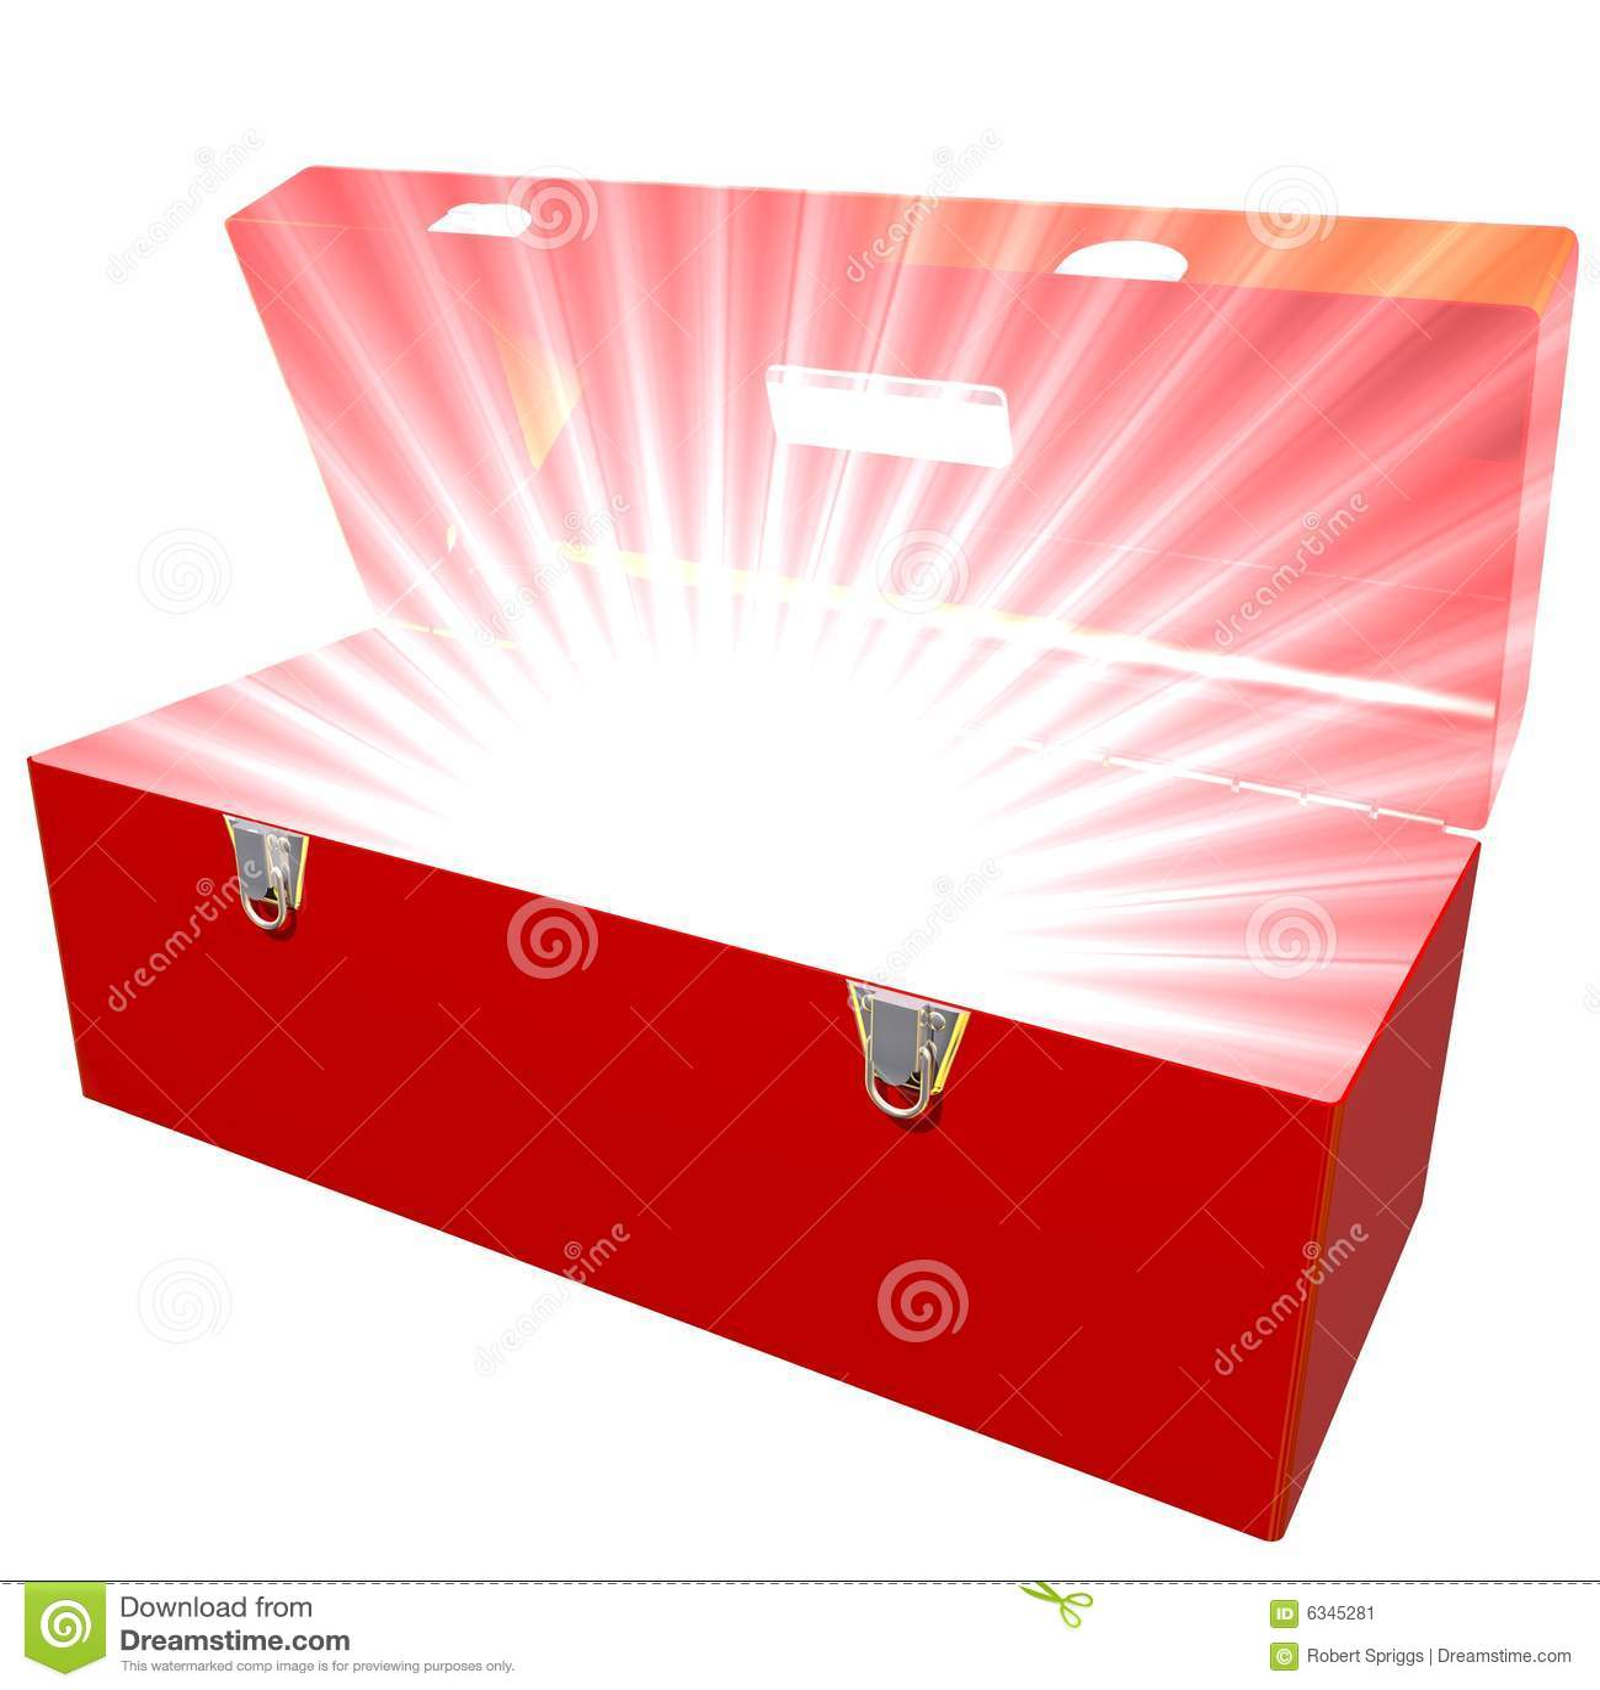 Caja de herramientas de estallido